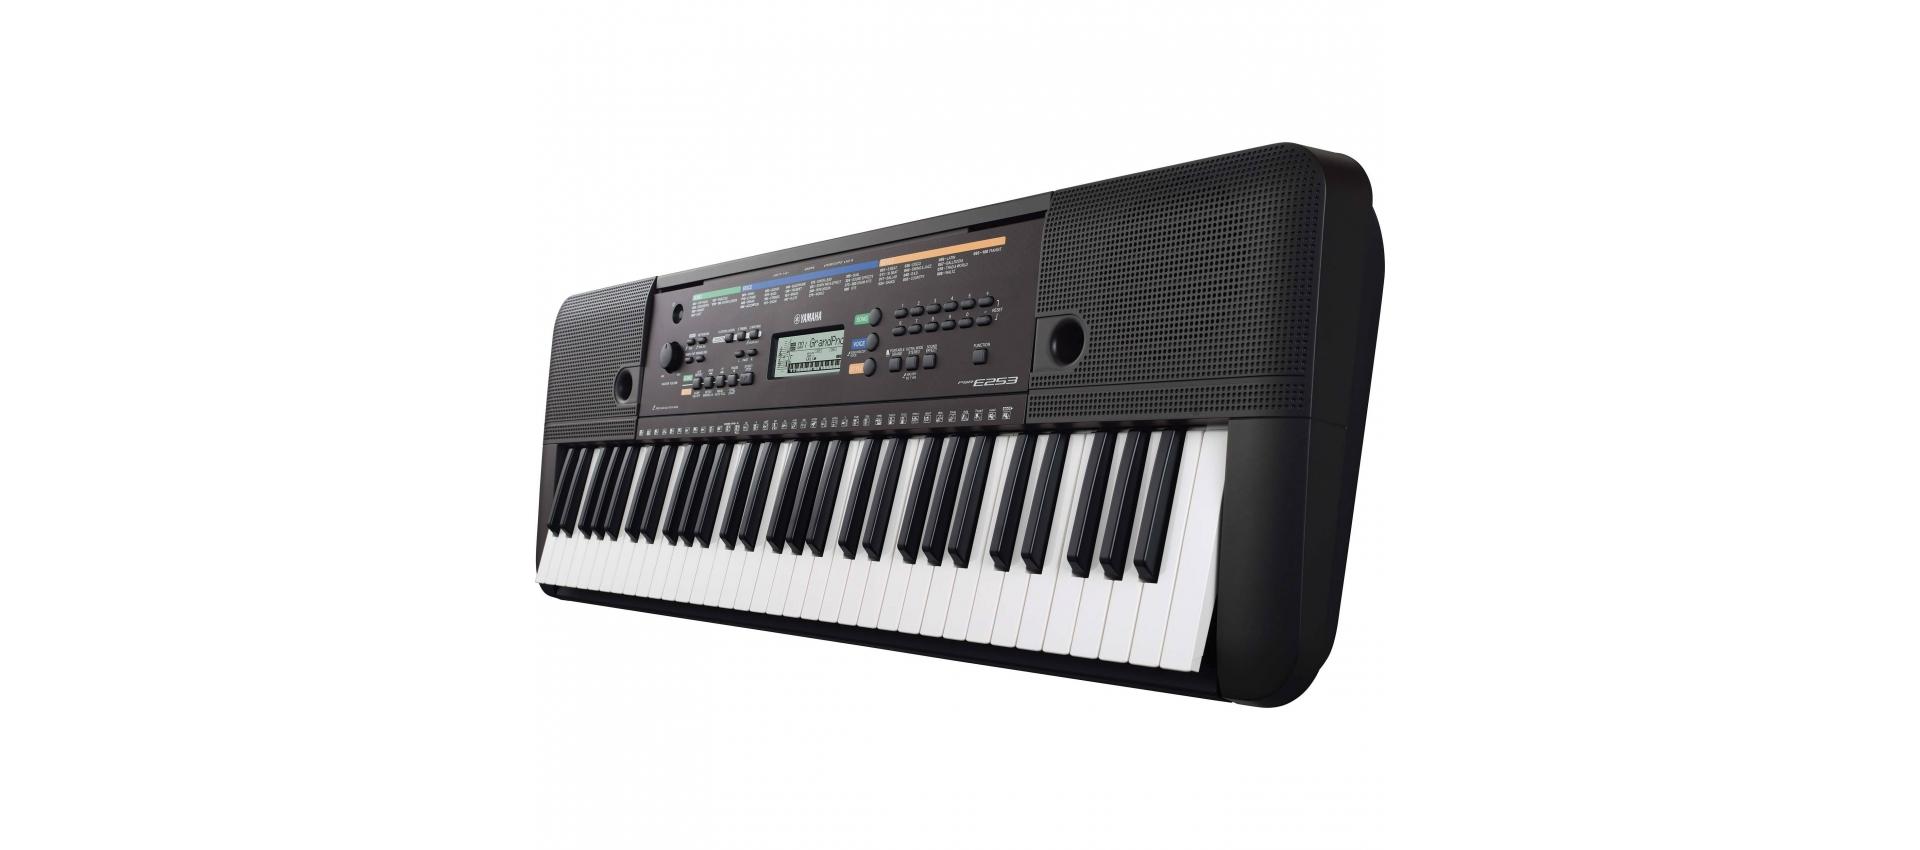 yamaha psr e253 tastiera 61 note con ritmi luckymusic. Black Bedroom Furniture Sets. Home Design Ideas